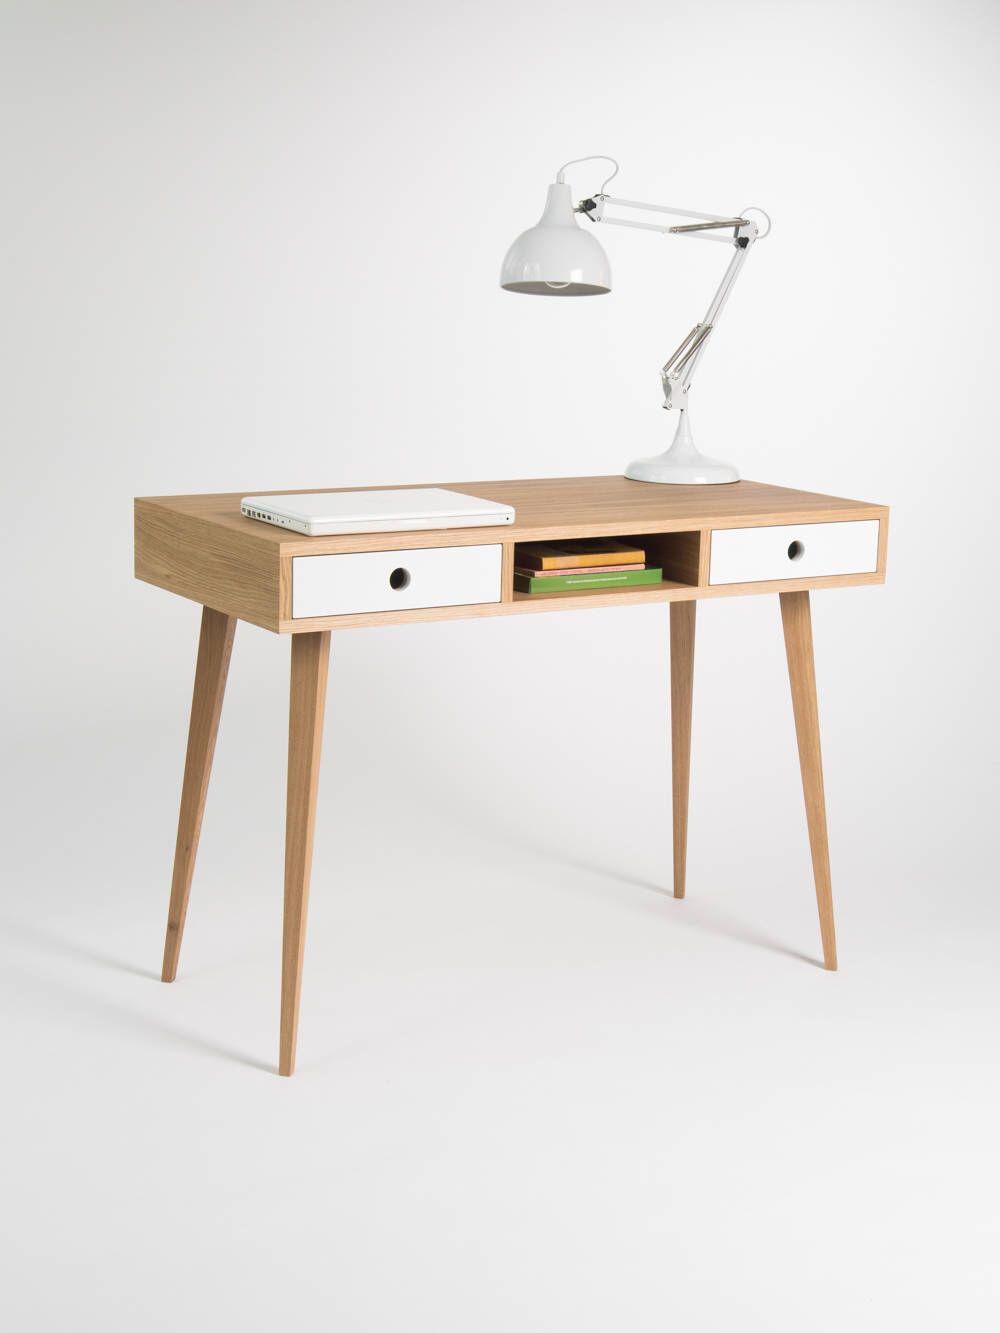 Desk For Home Dressing Table Bureau With White Drawers Oak Wood Scandinavian Design Mid Century Modern Home Desk Oak Wood Desk Scandinavian Design